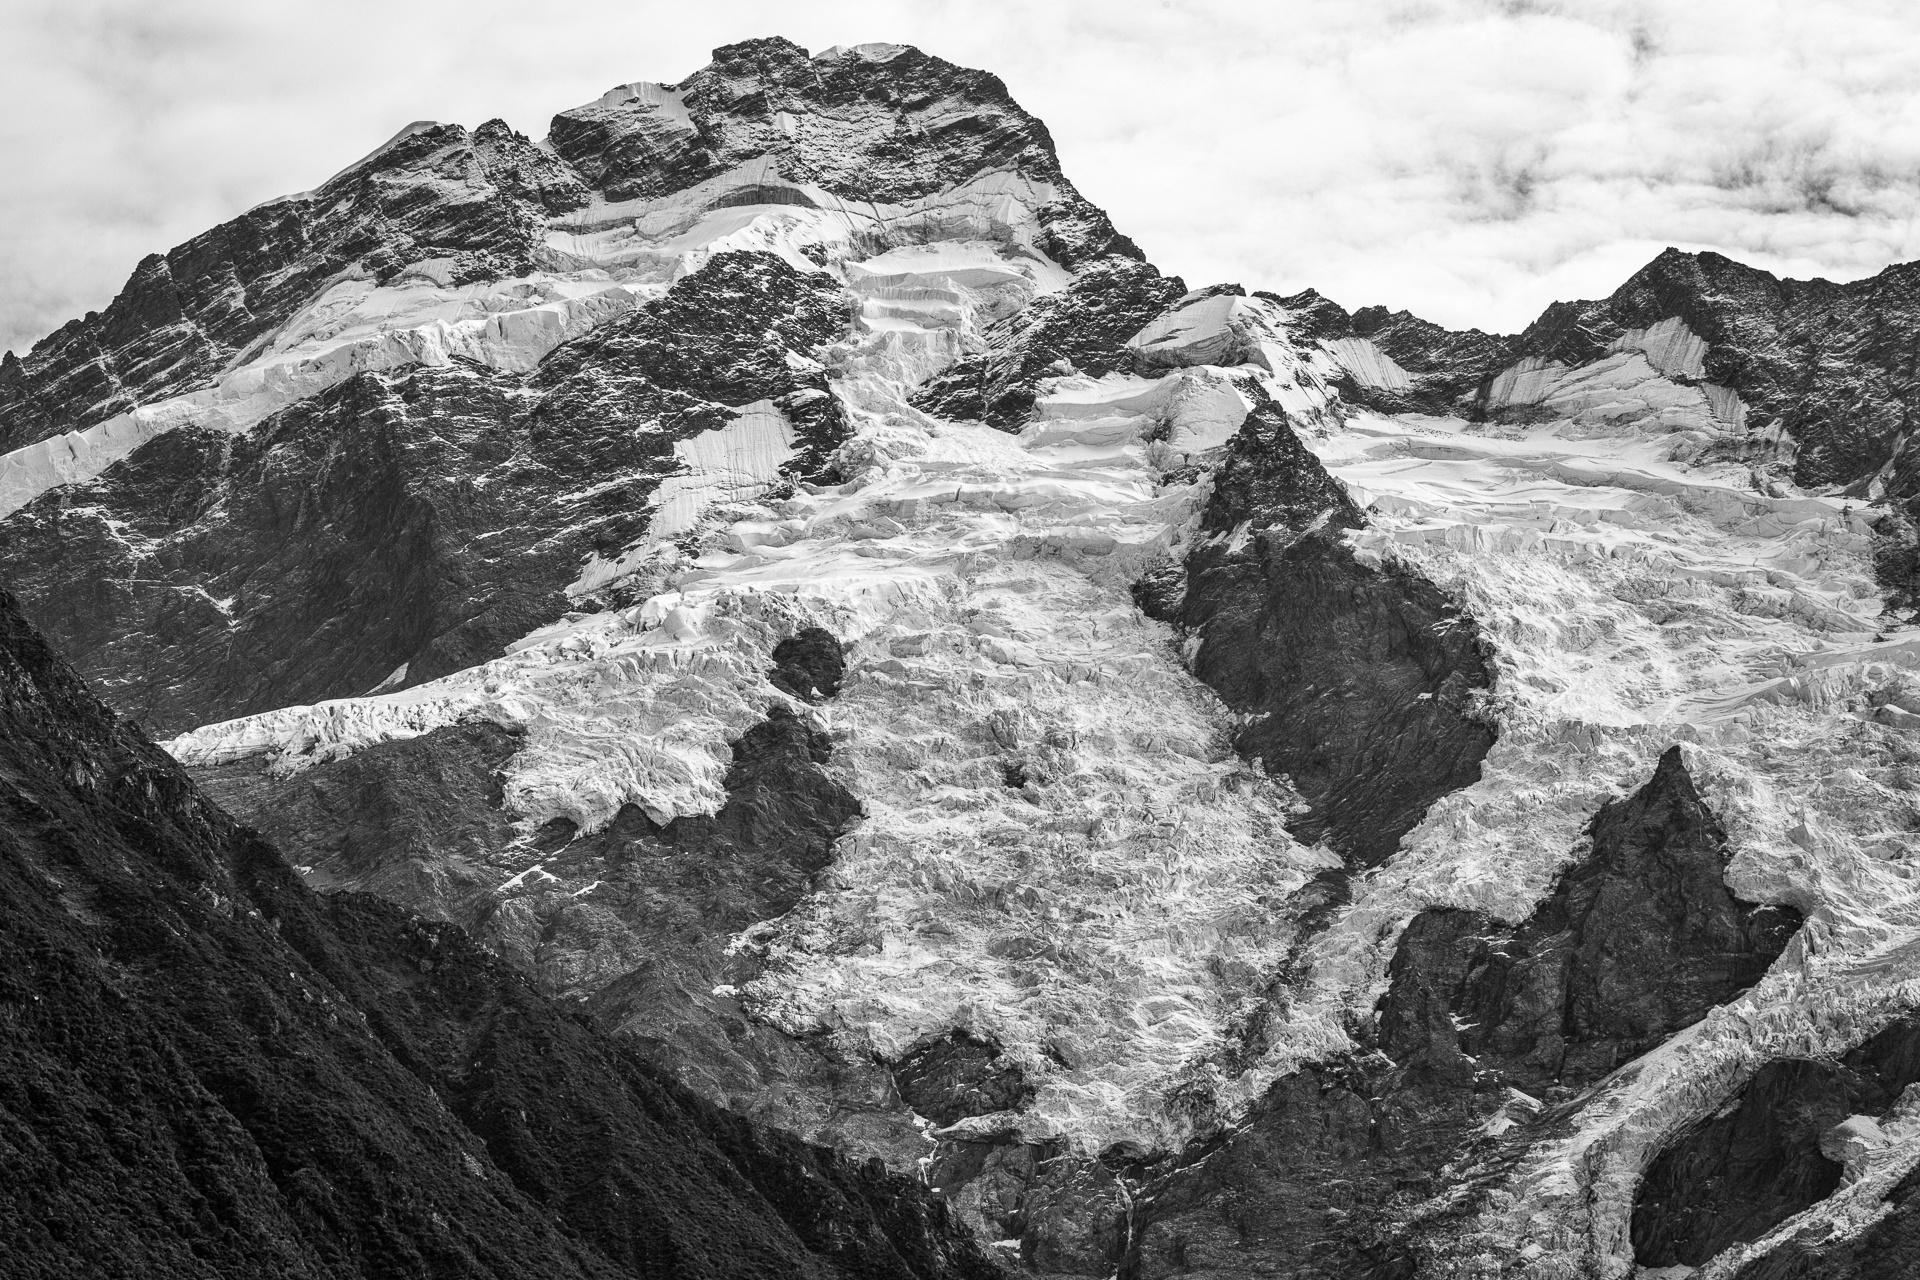 Glaciers at the top of Mt Tasman